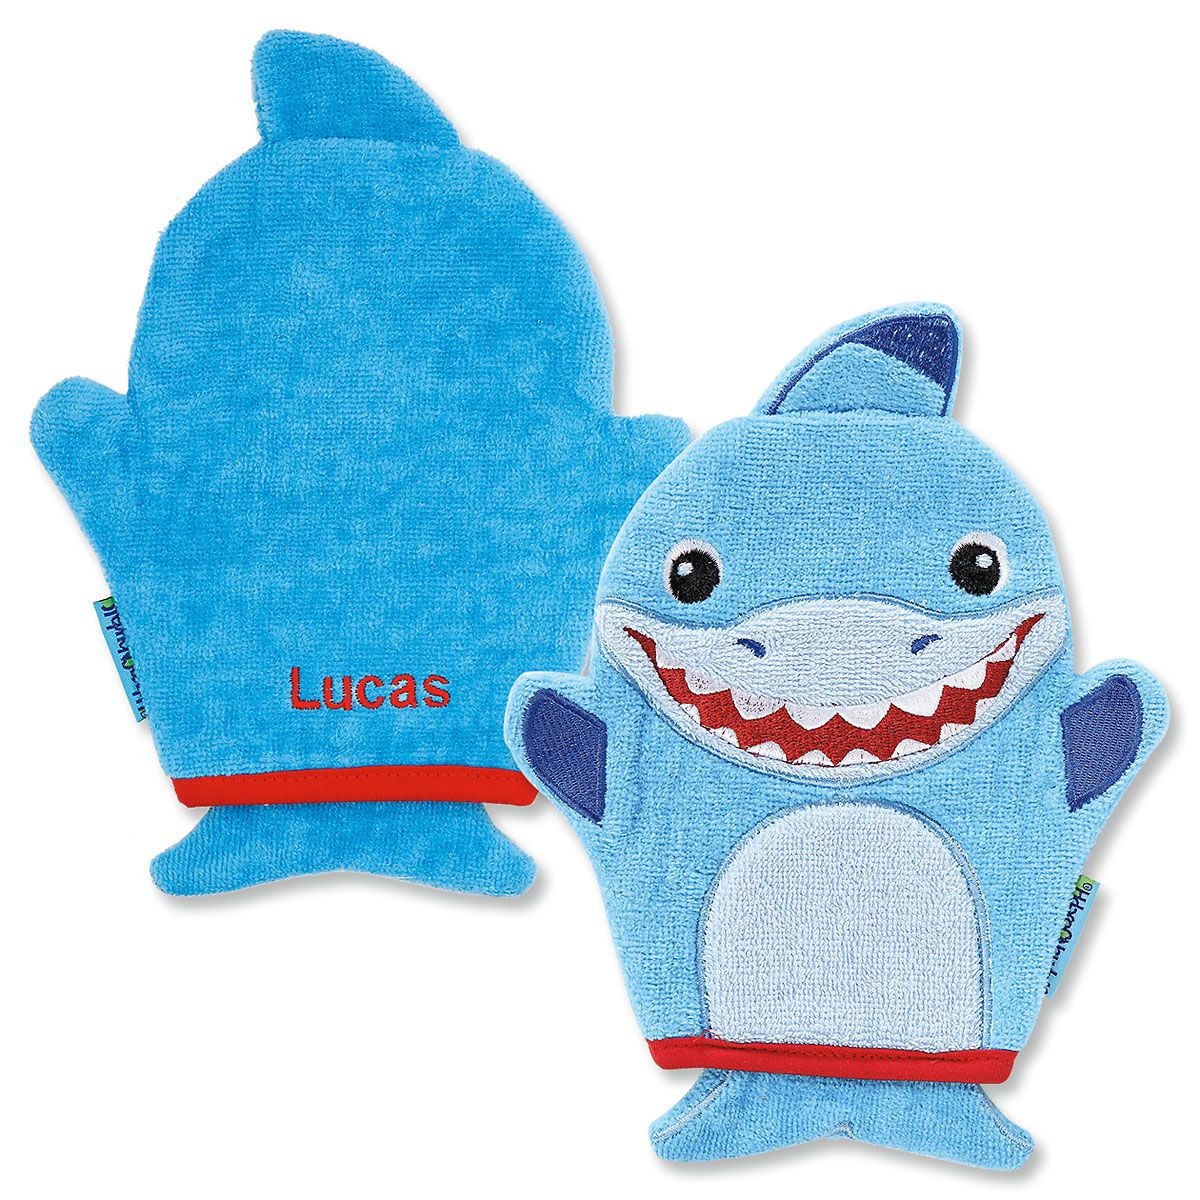 Personalized Shark Bath Mitt by Stephen Joseph®